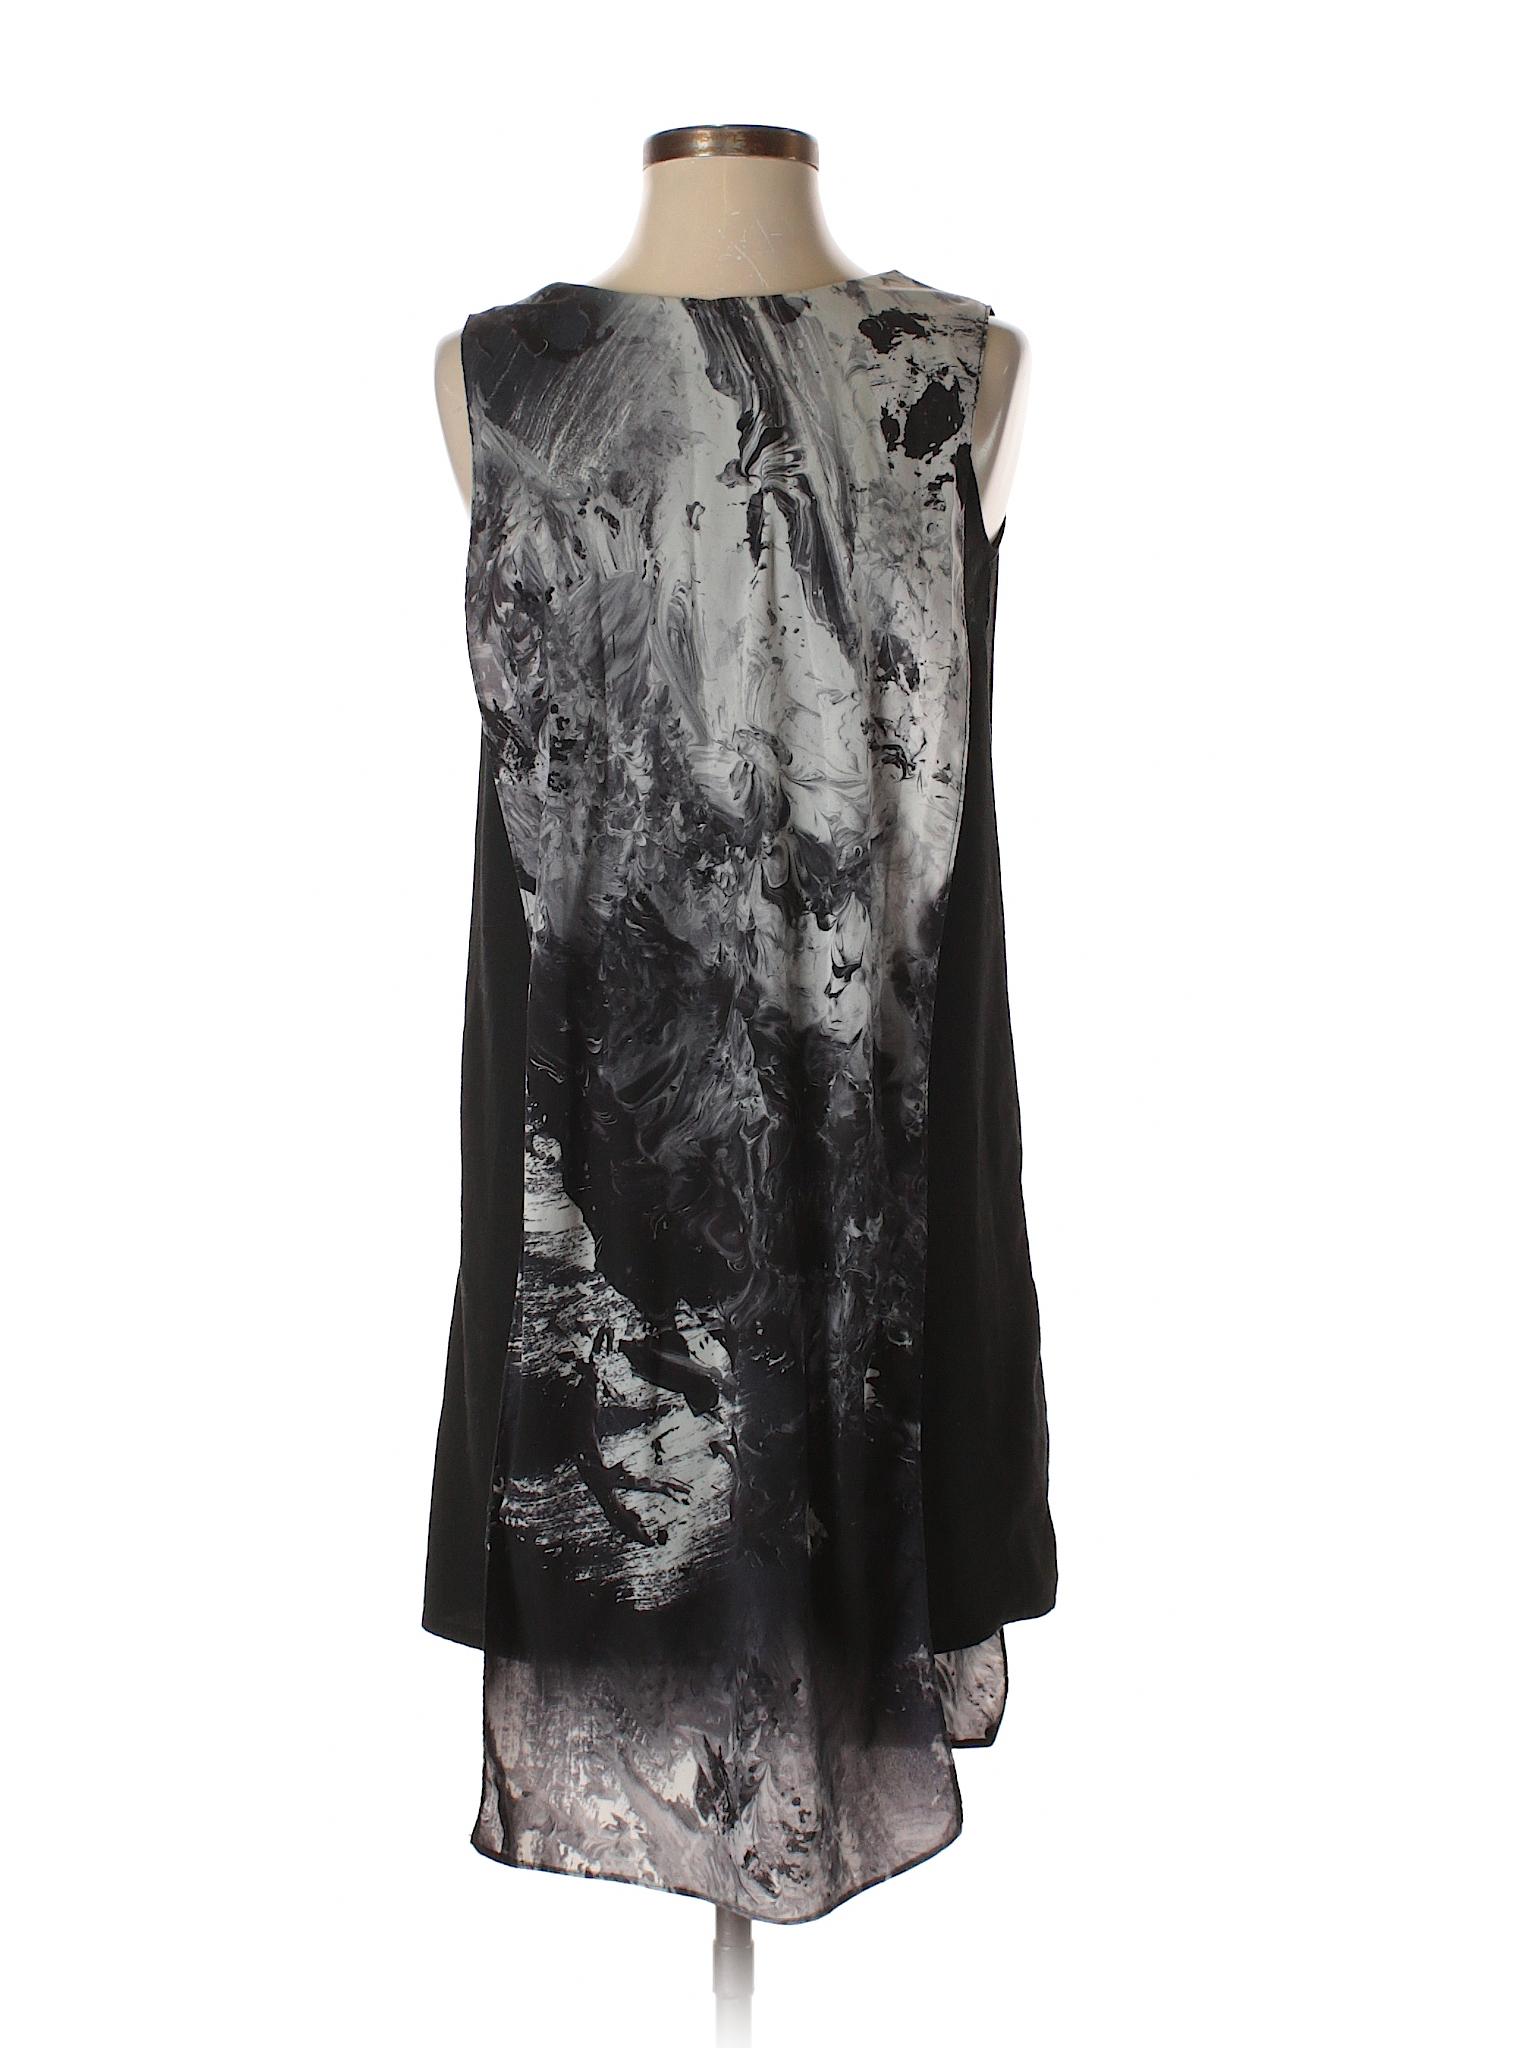 Boutique winter winter Casual ASOS Casual Boutique ASOS Dress Boutique winter ASOS Dress Casual Haq4SwxC